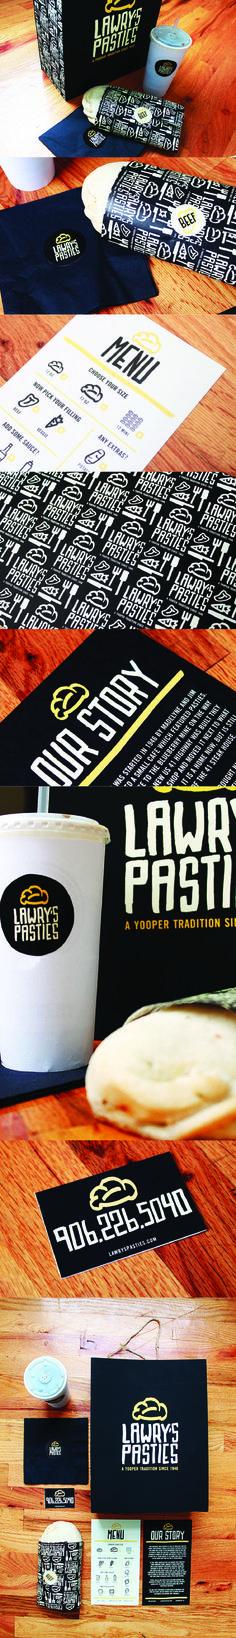 lawry's pastries